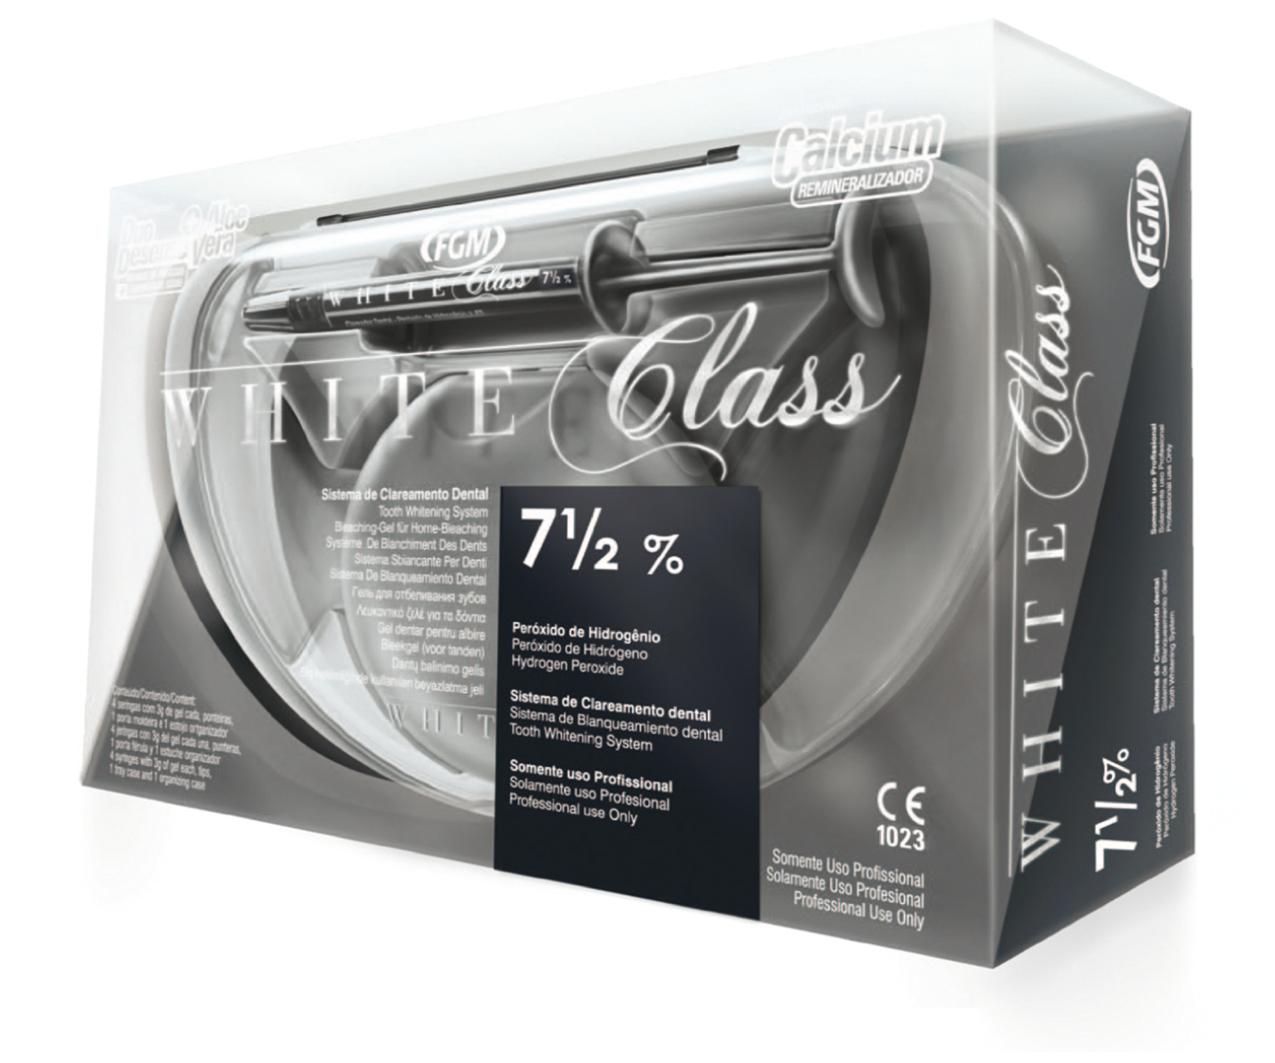 WHITE CLASS WITH CALCIUM-image